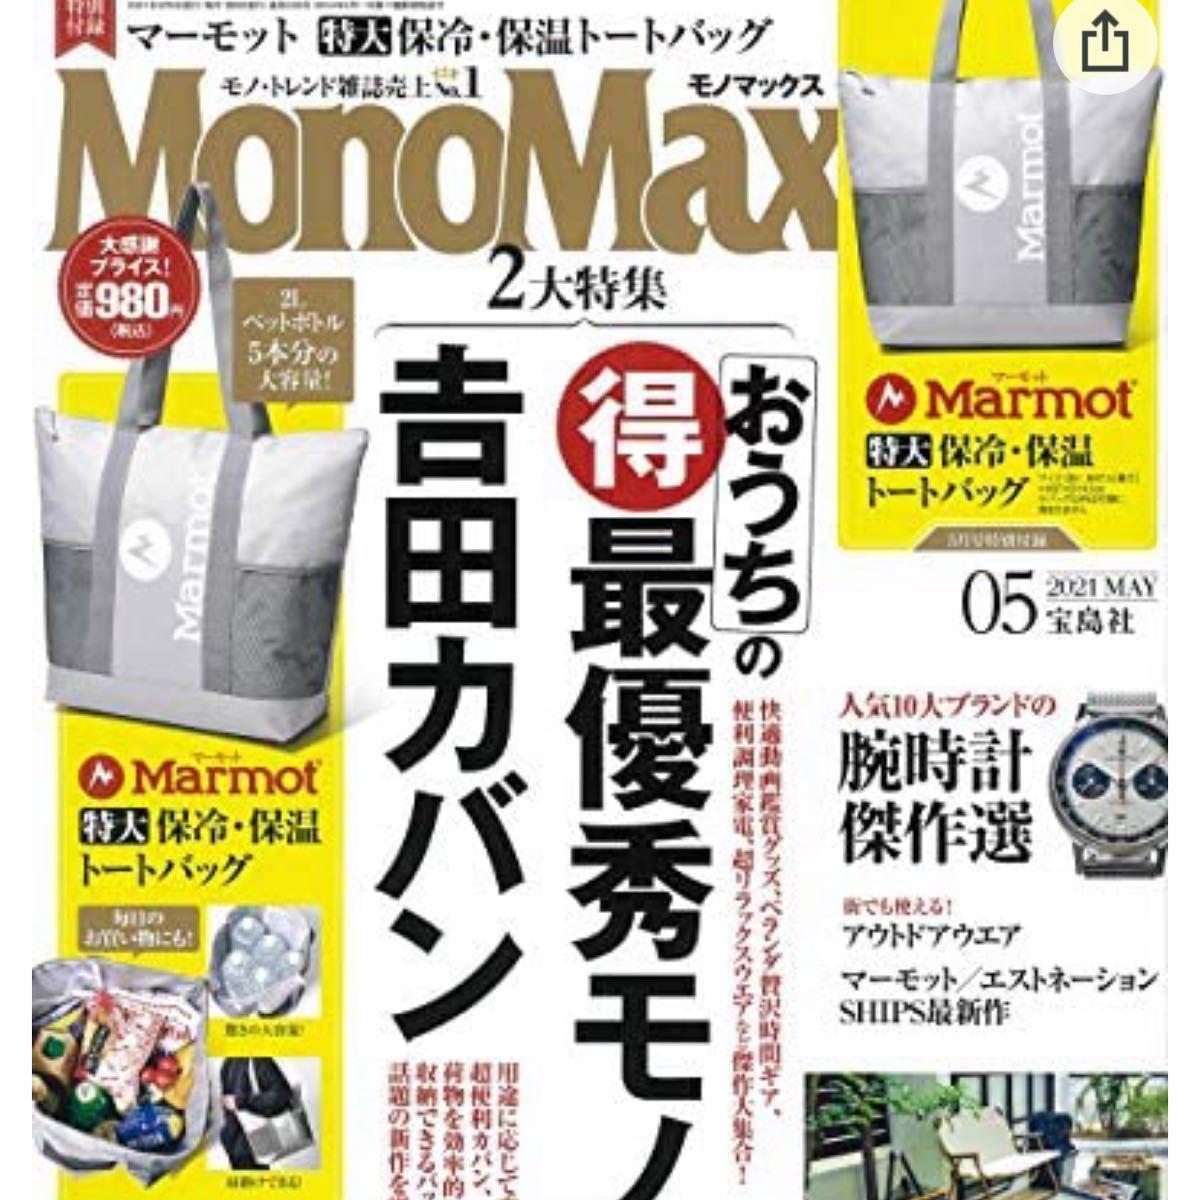 Marmot[マーモット]特大保冷・保温トートバッグ